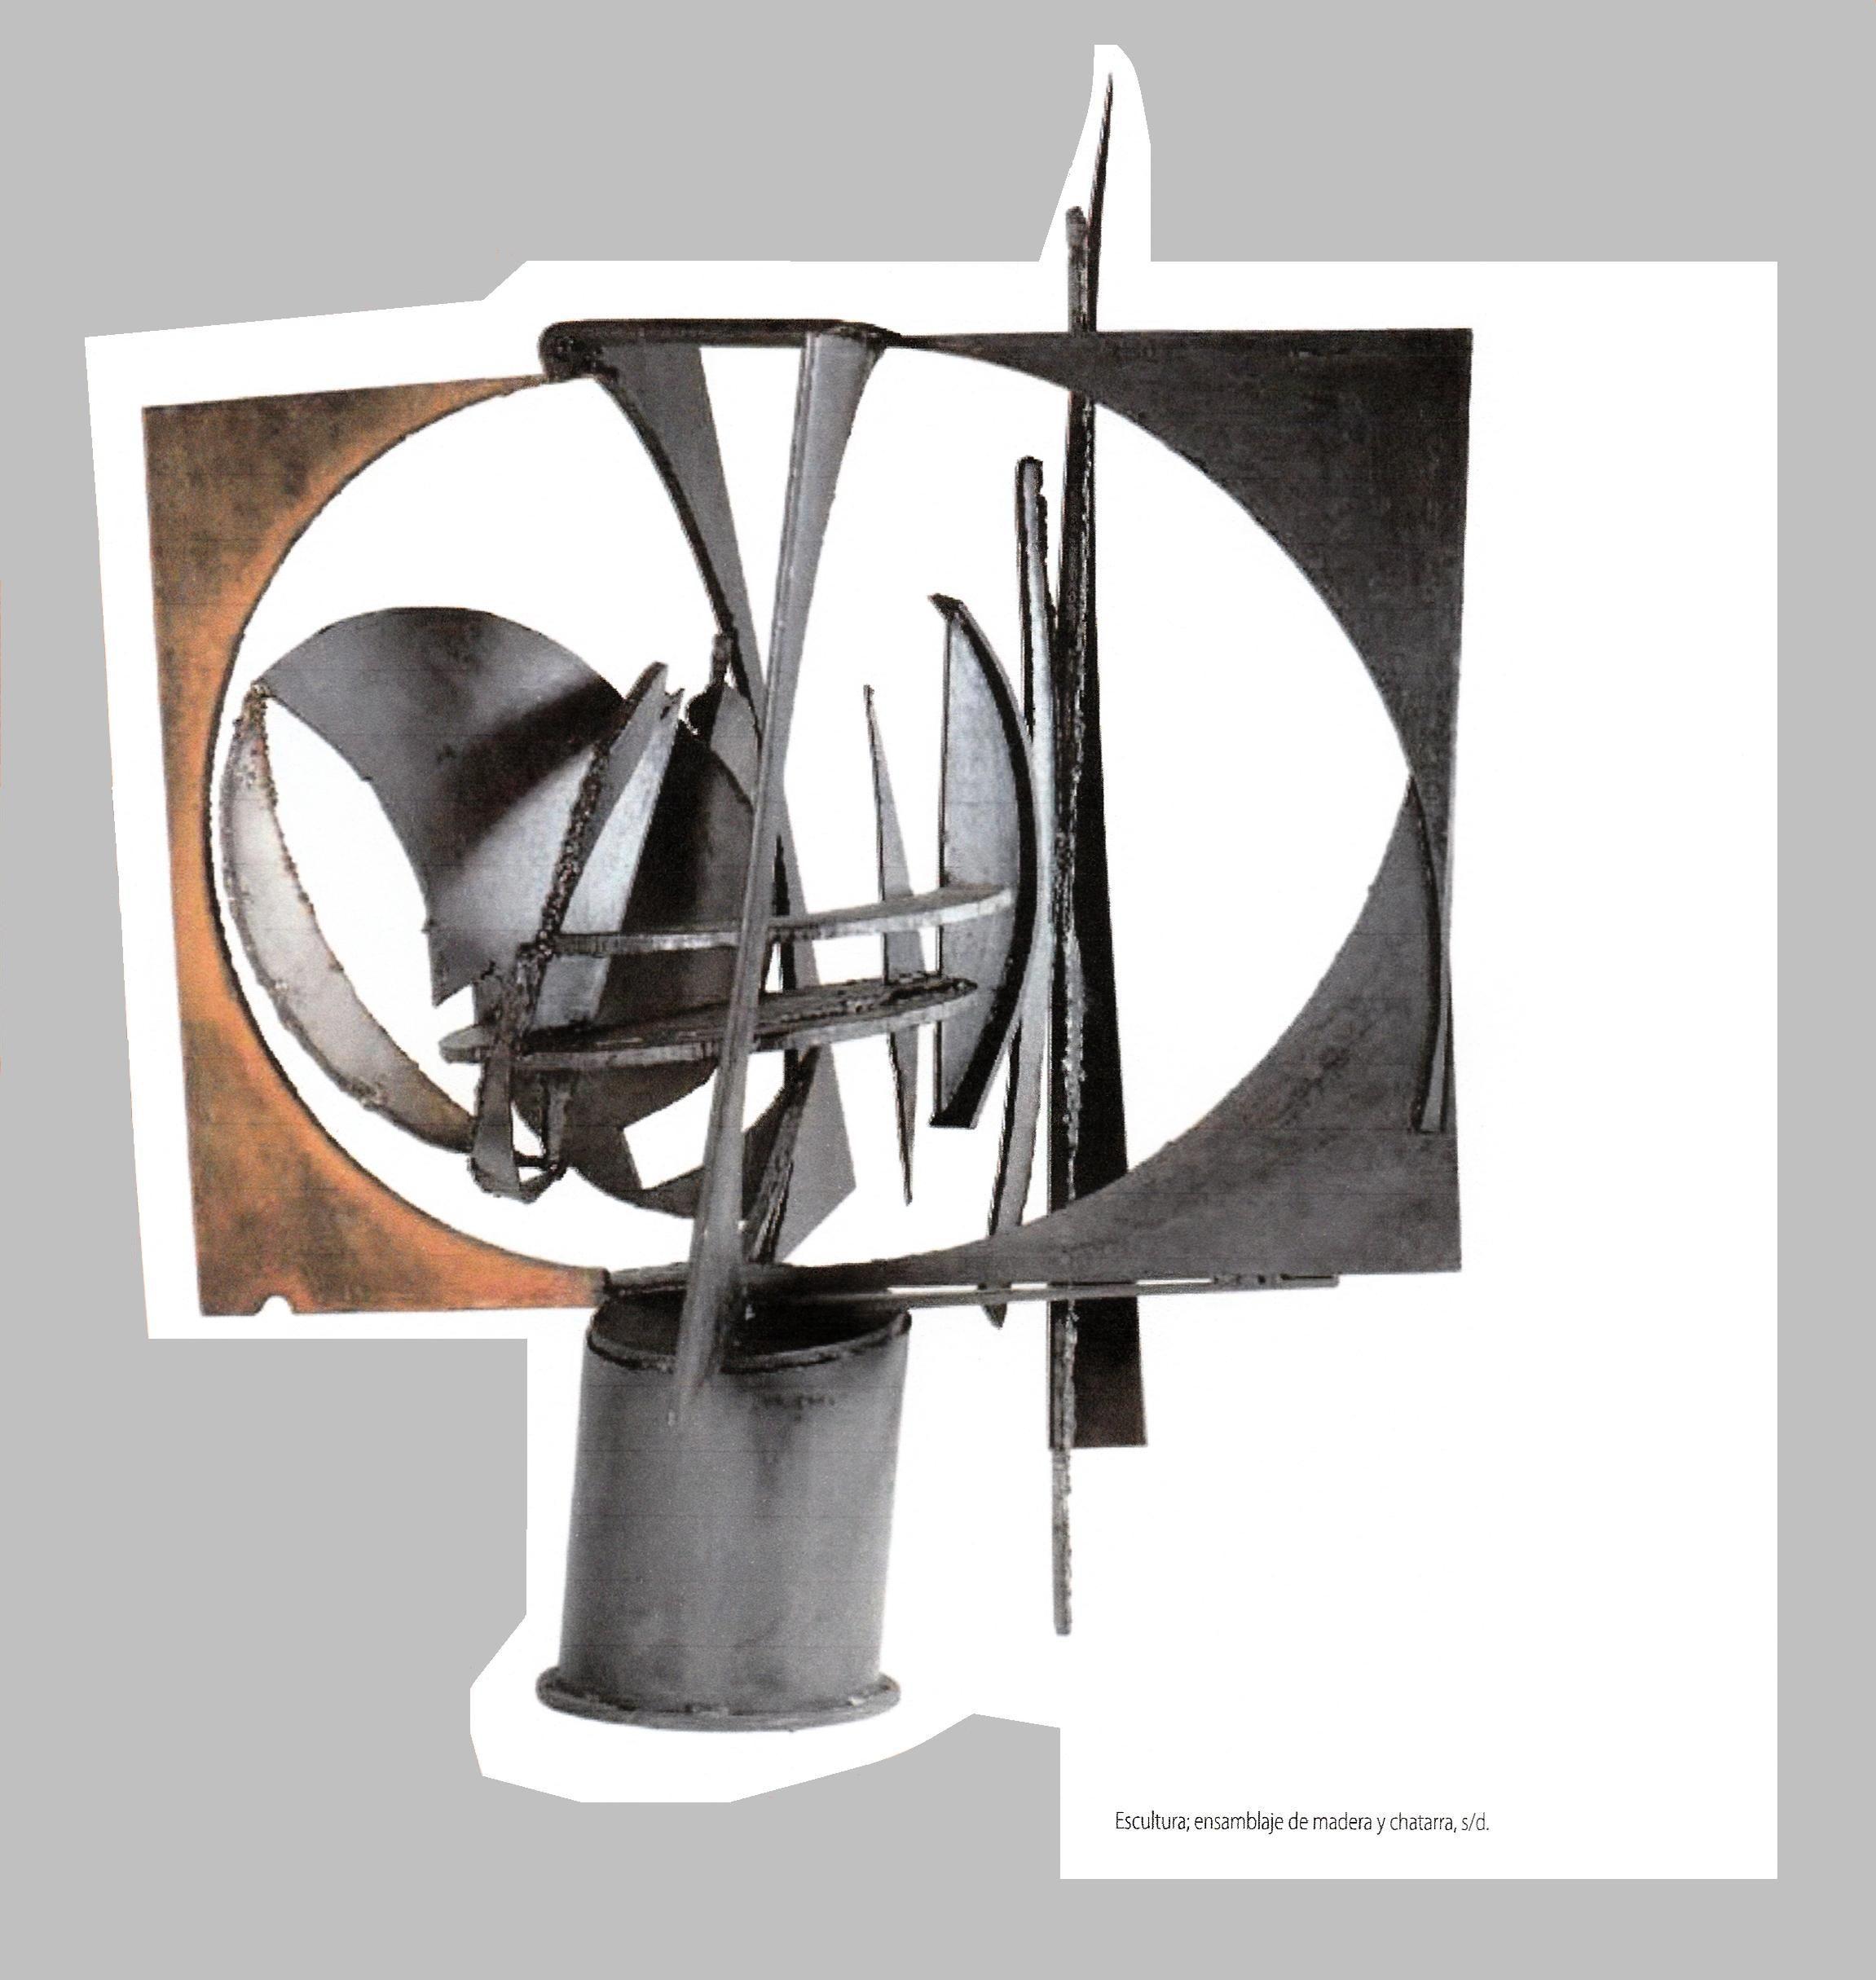 Escultura Chatarra Y Madera Autor Octavi Podest Montevideo  # Muebles Podesta